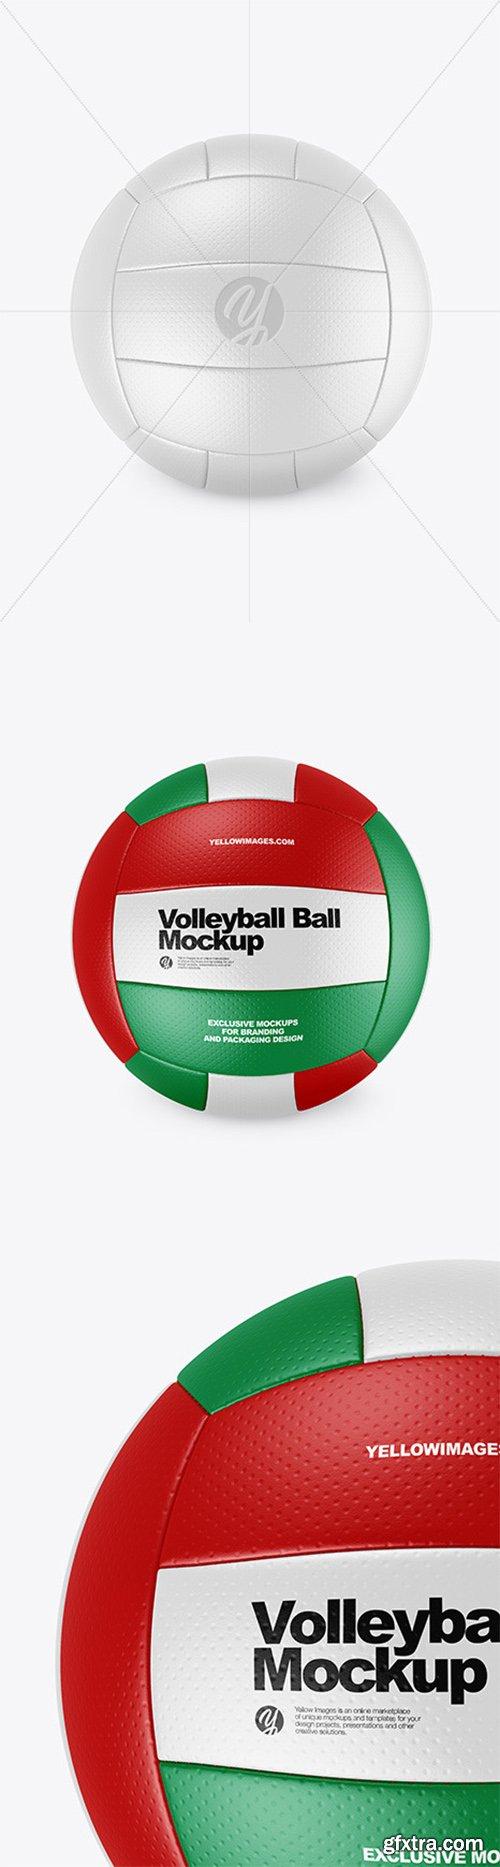 Volleyball Ball Mockup 65755